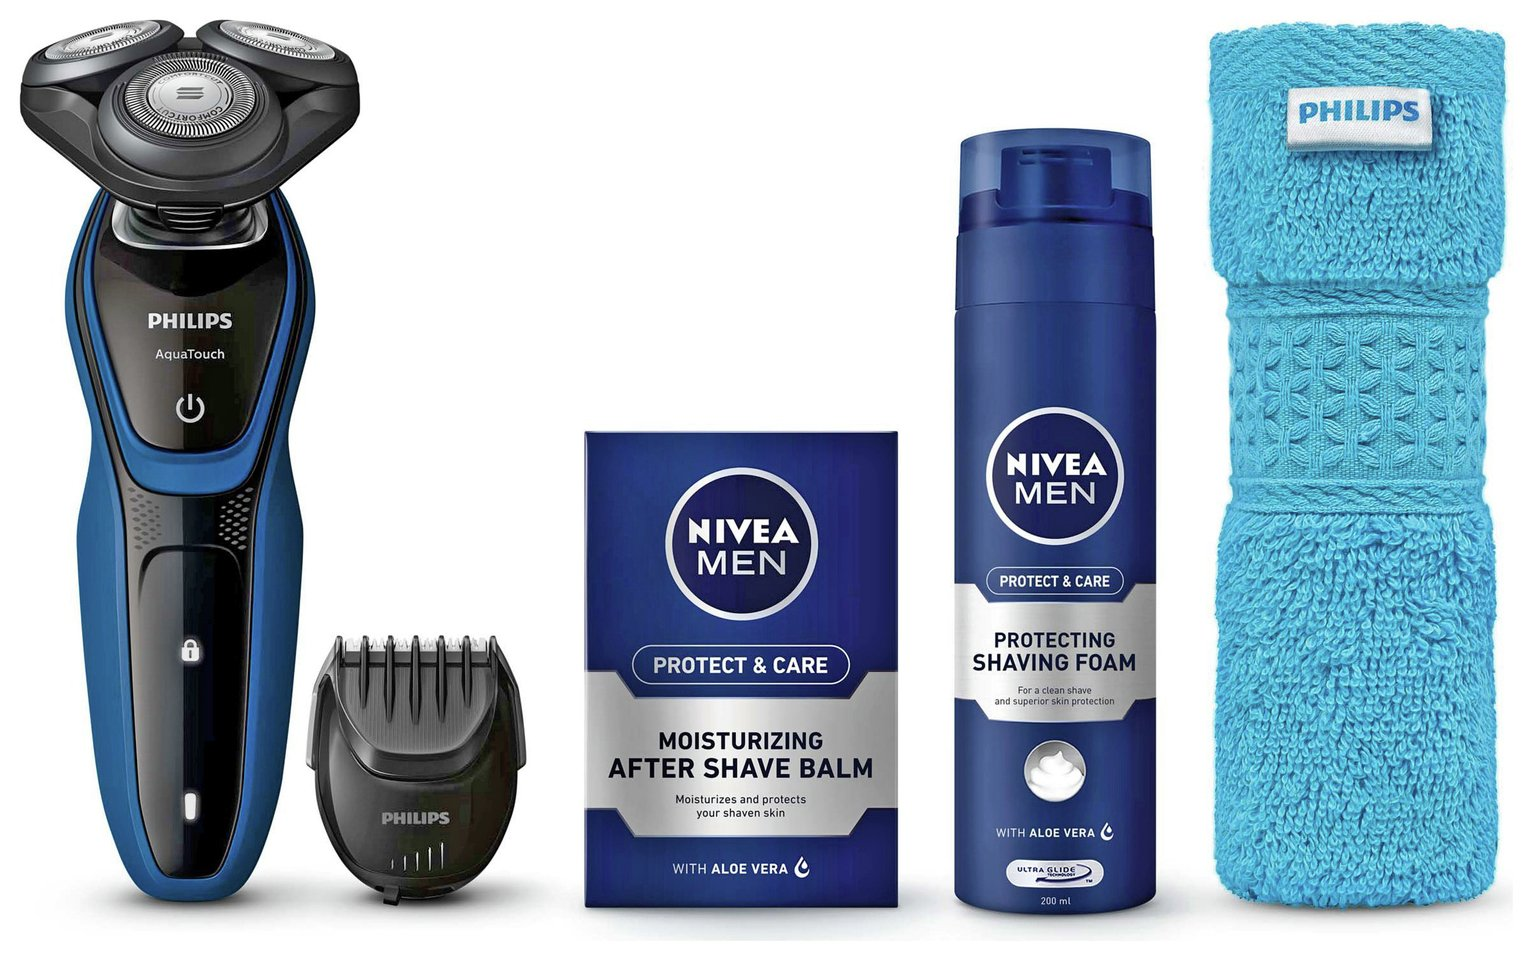 Philips 5000 Series Shaver Gift Set